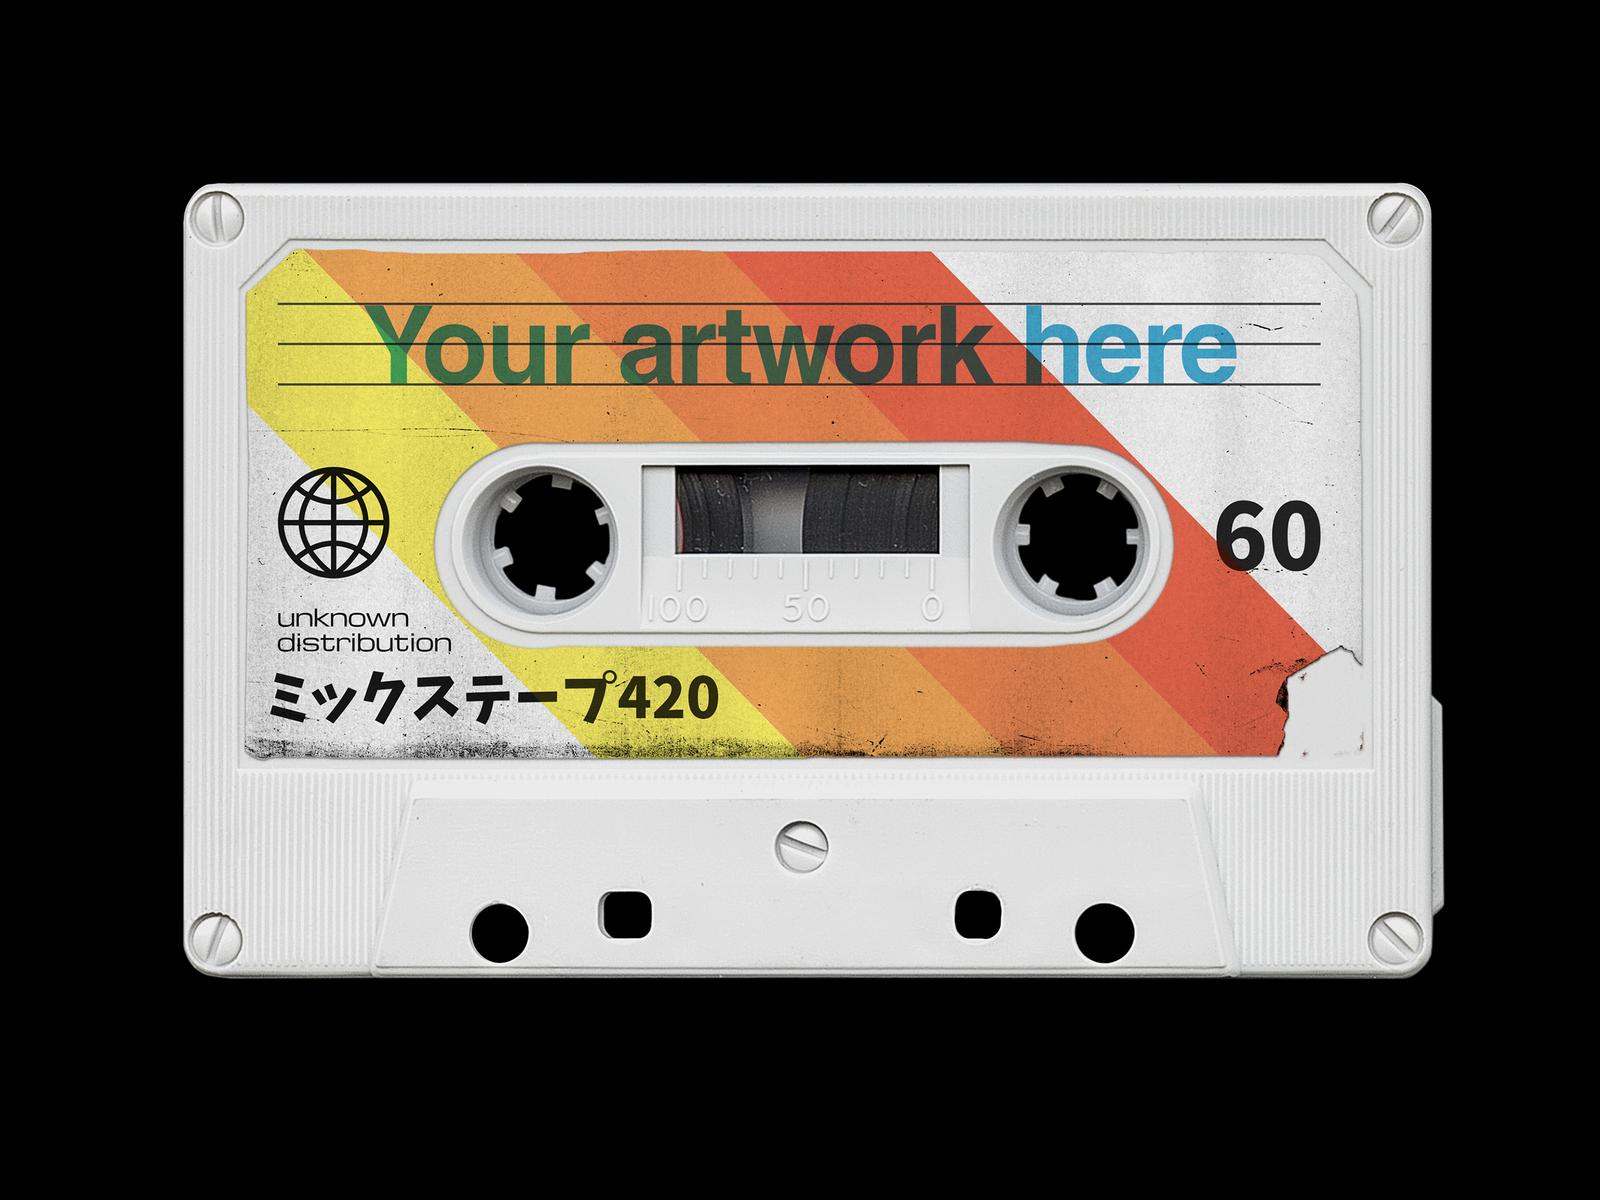 Vintage Cassette Tape Mockup by Dominik Schneider on Dribbble